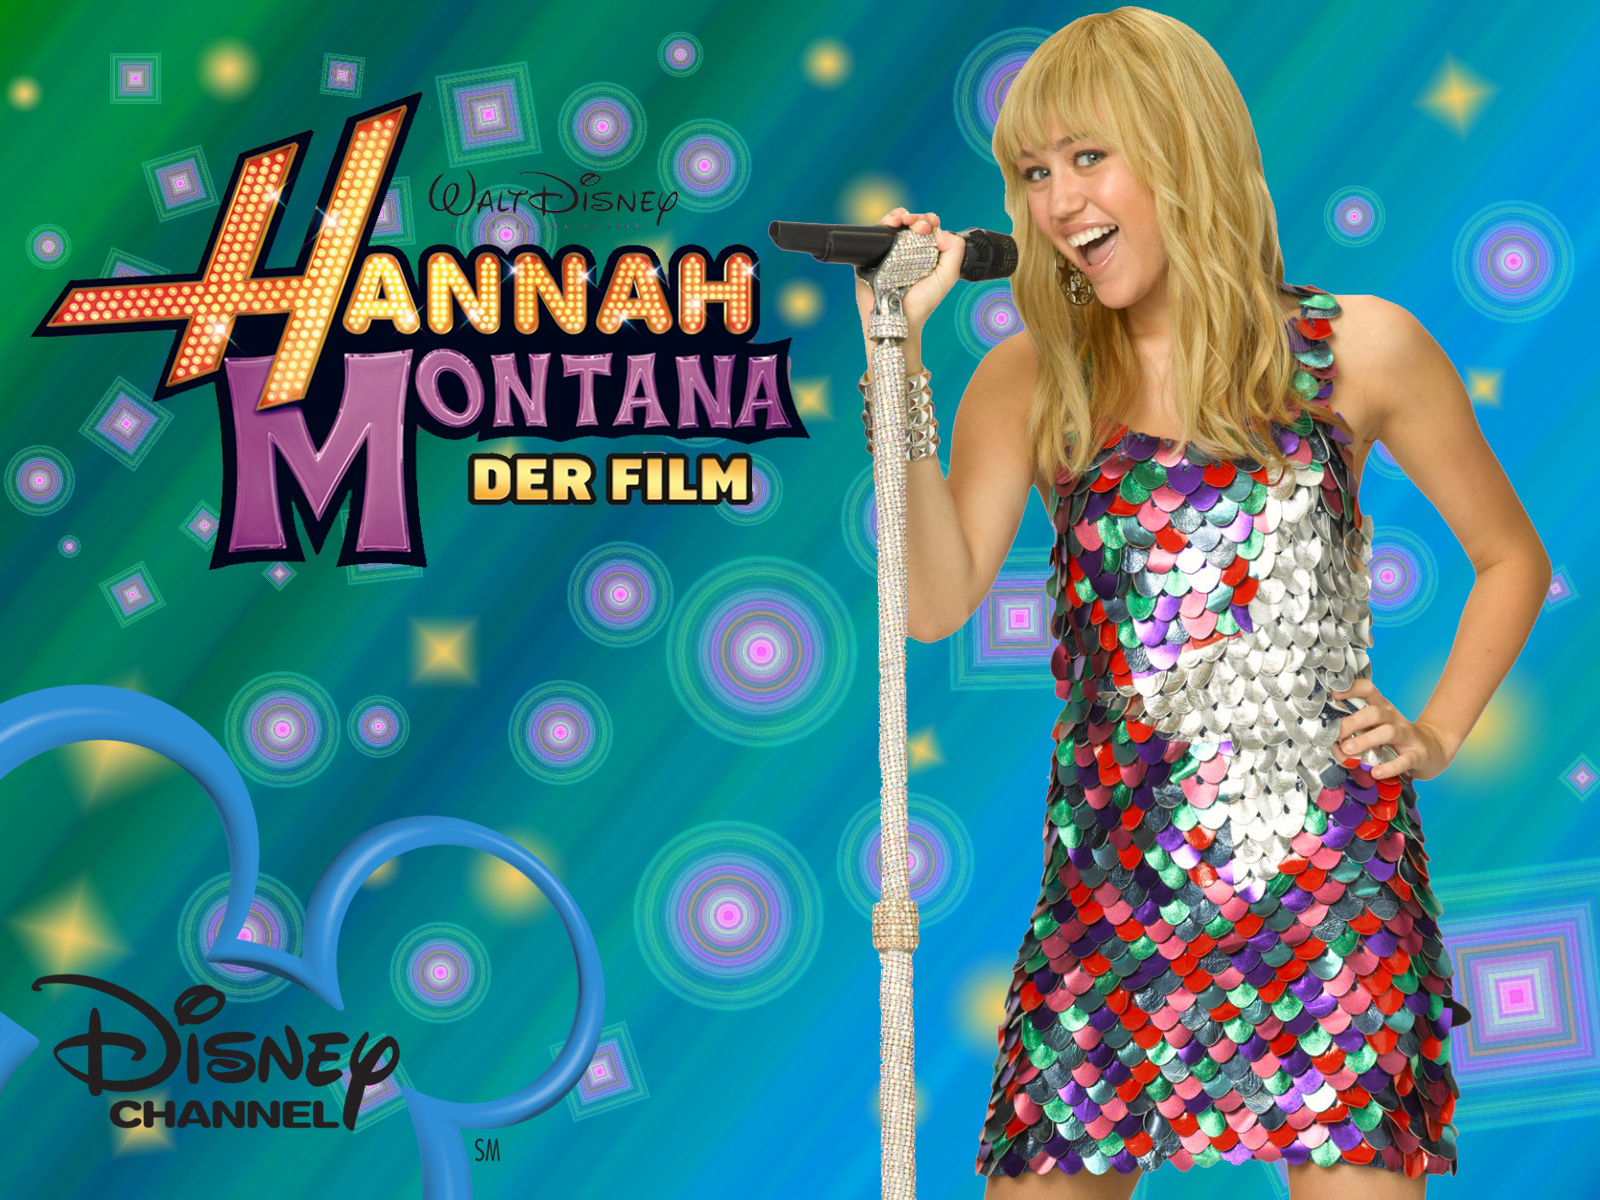 hANNAH monTANA THE movie!!!!!! - hannah-montana wallpaper